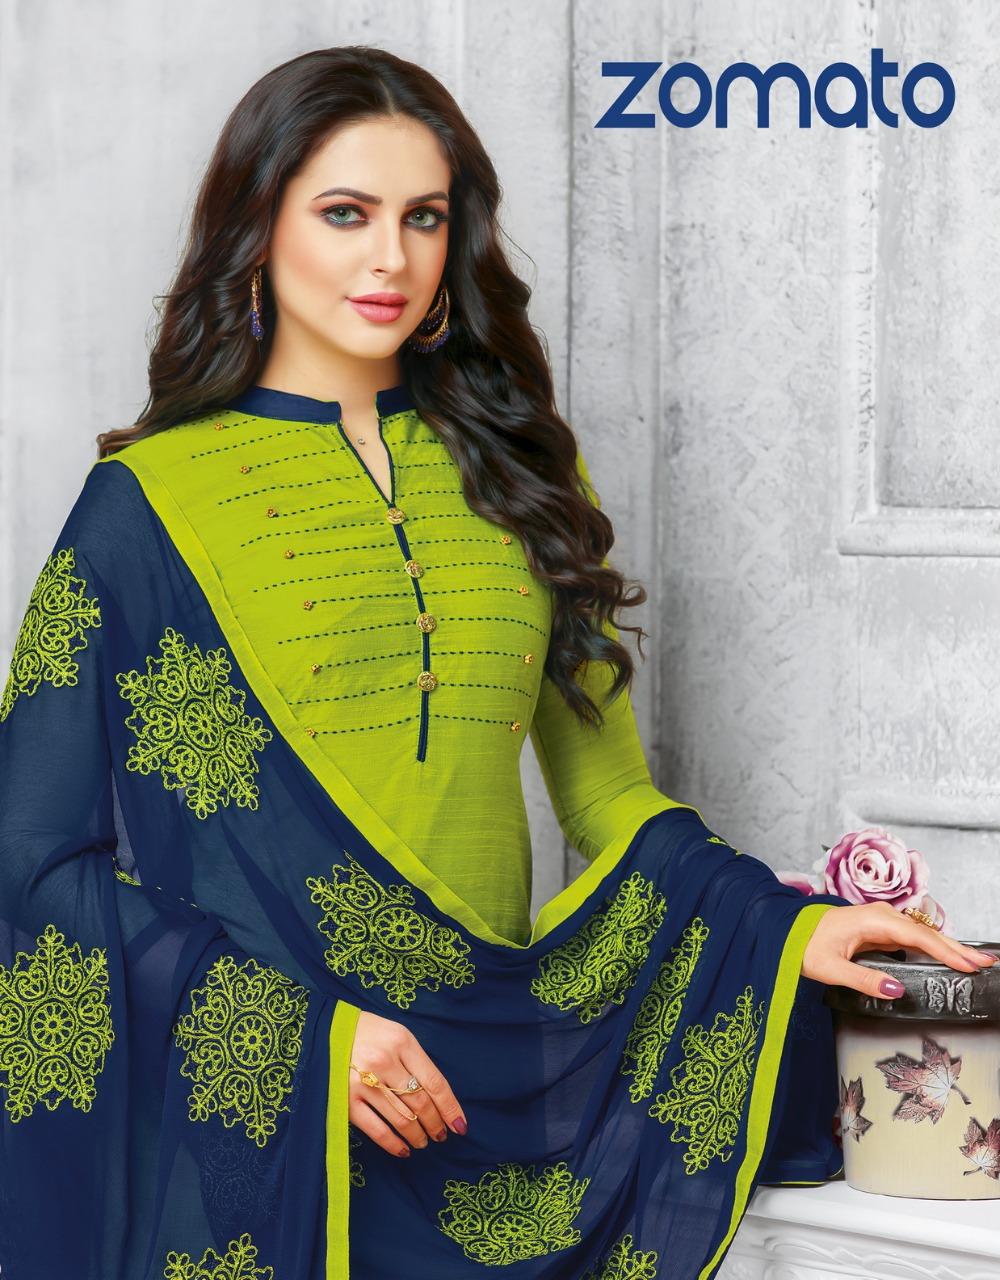 Kapil Trendz Zomato Salwar Suit Wholesale Catalog 12 Pcs 12 - Kapil Trendz Zomato Salwar Suit Wholesale Catalog 12 Pcs